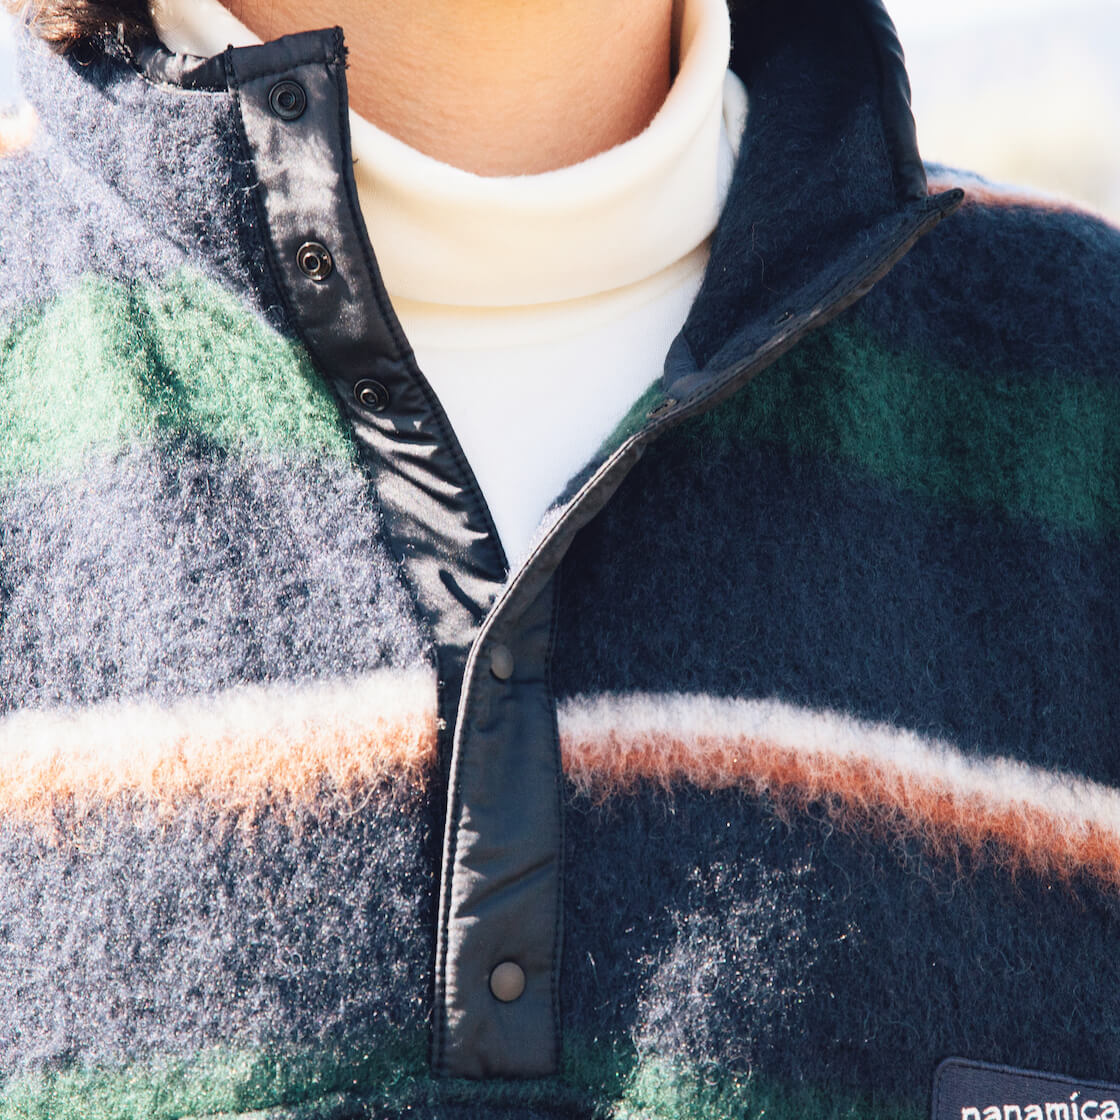 nanamica pullover sweater and nanamica white turtleneck on body